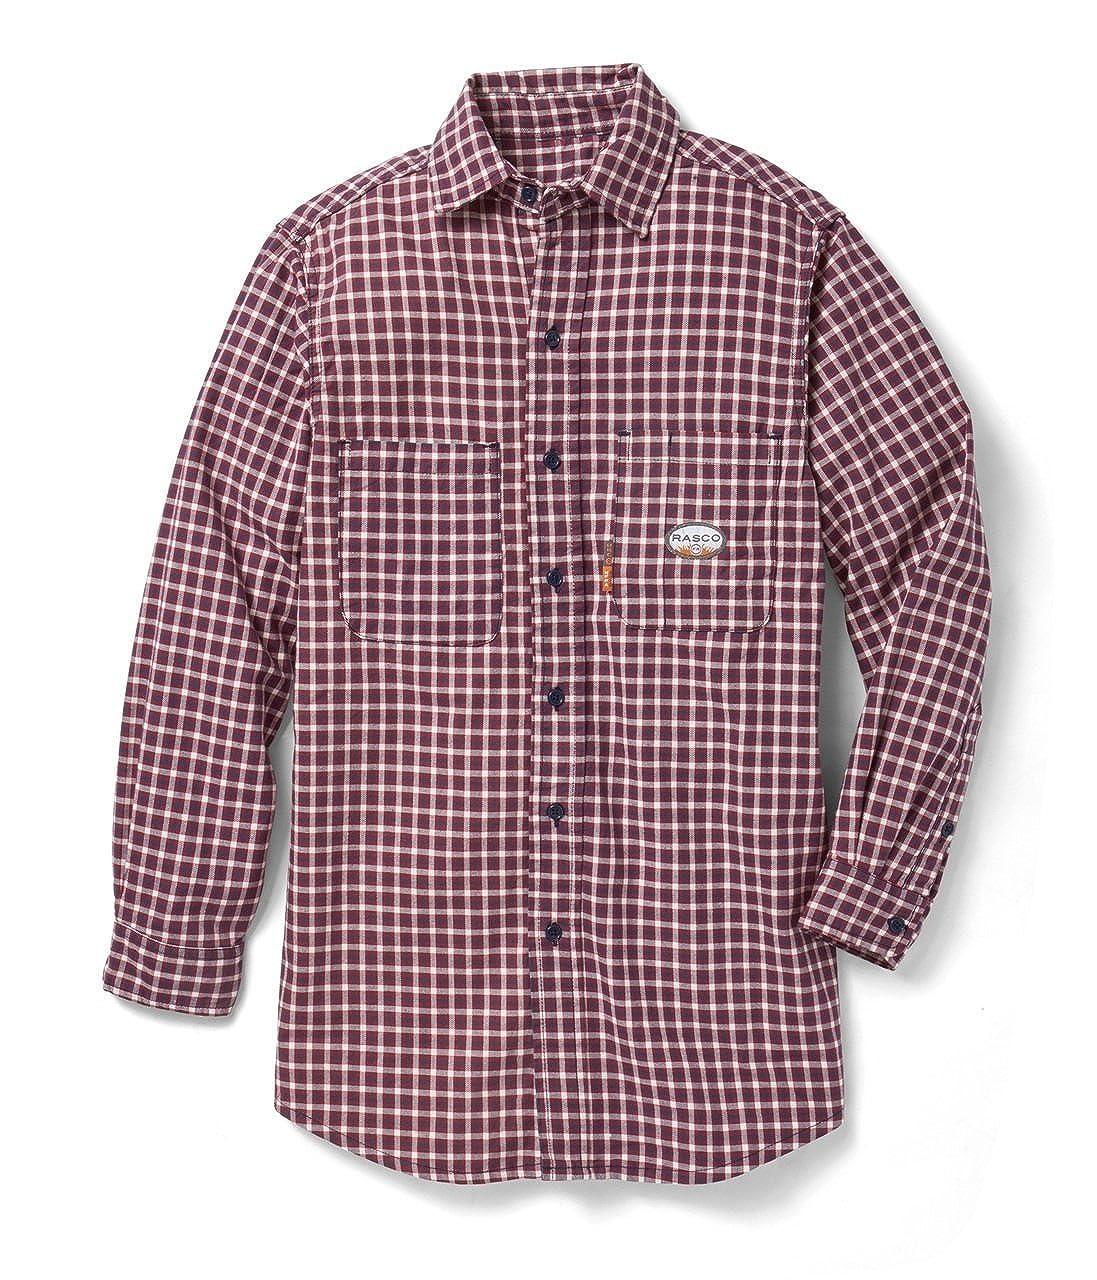 4be6f502c9d8 Top6  Rasco FR Red Plaid Dress Shirt 7.5 oz. Wholesale ...